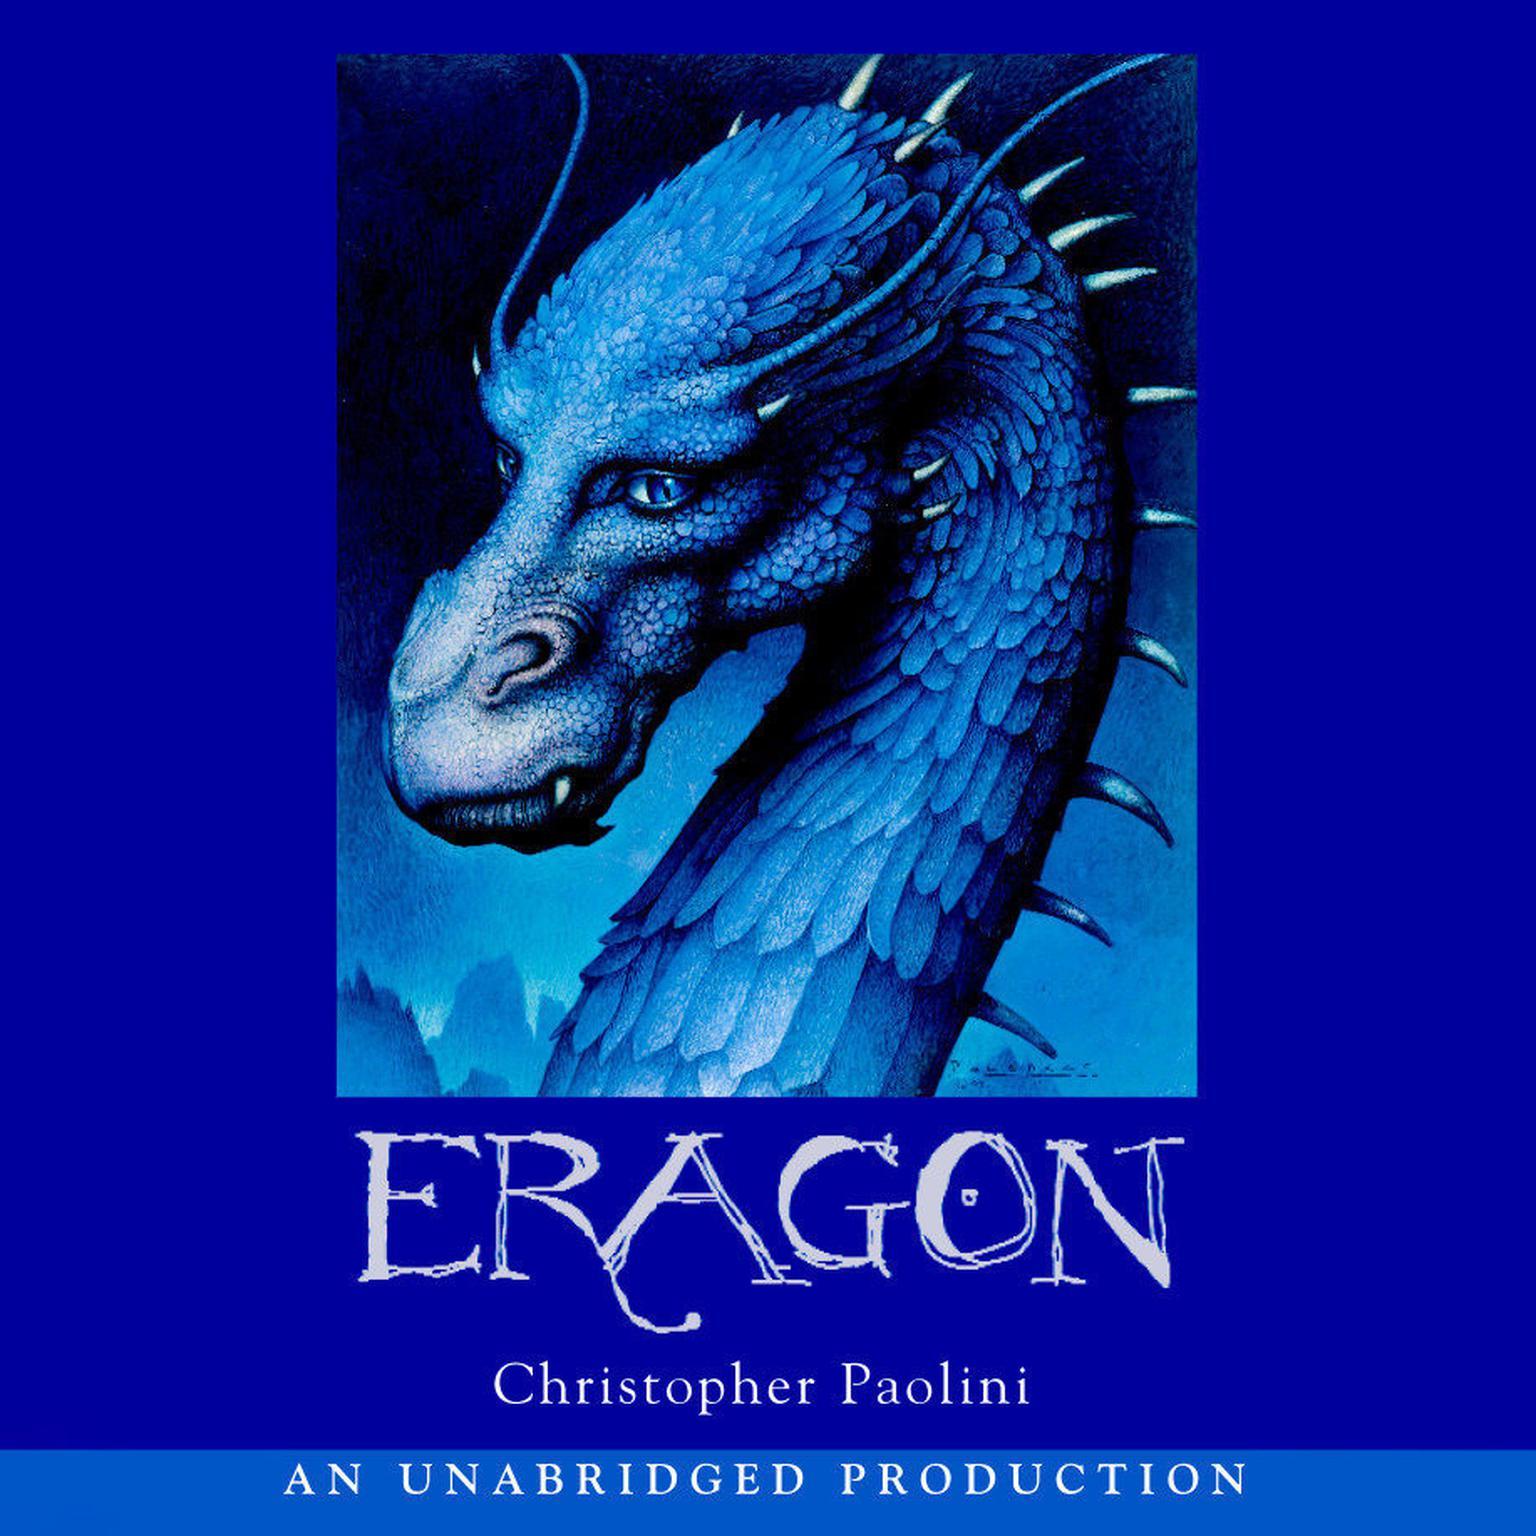 Eragon Book 4 Audiobook